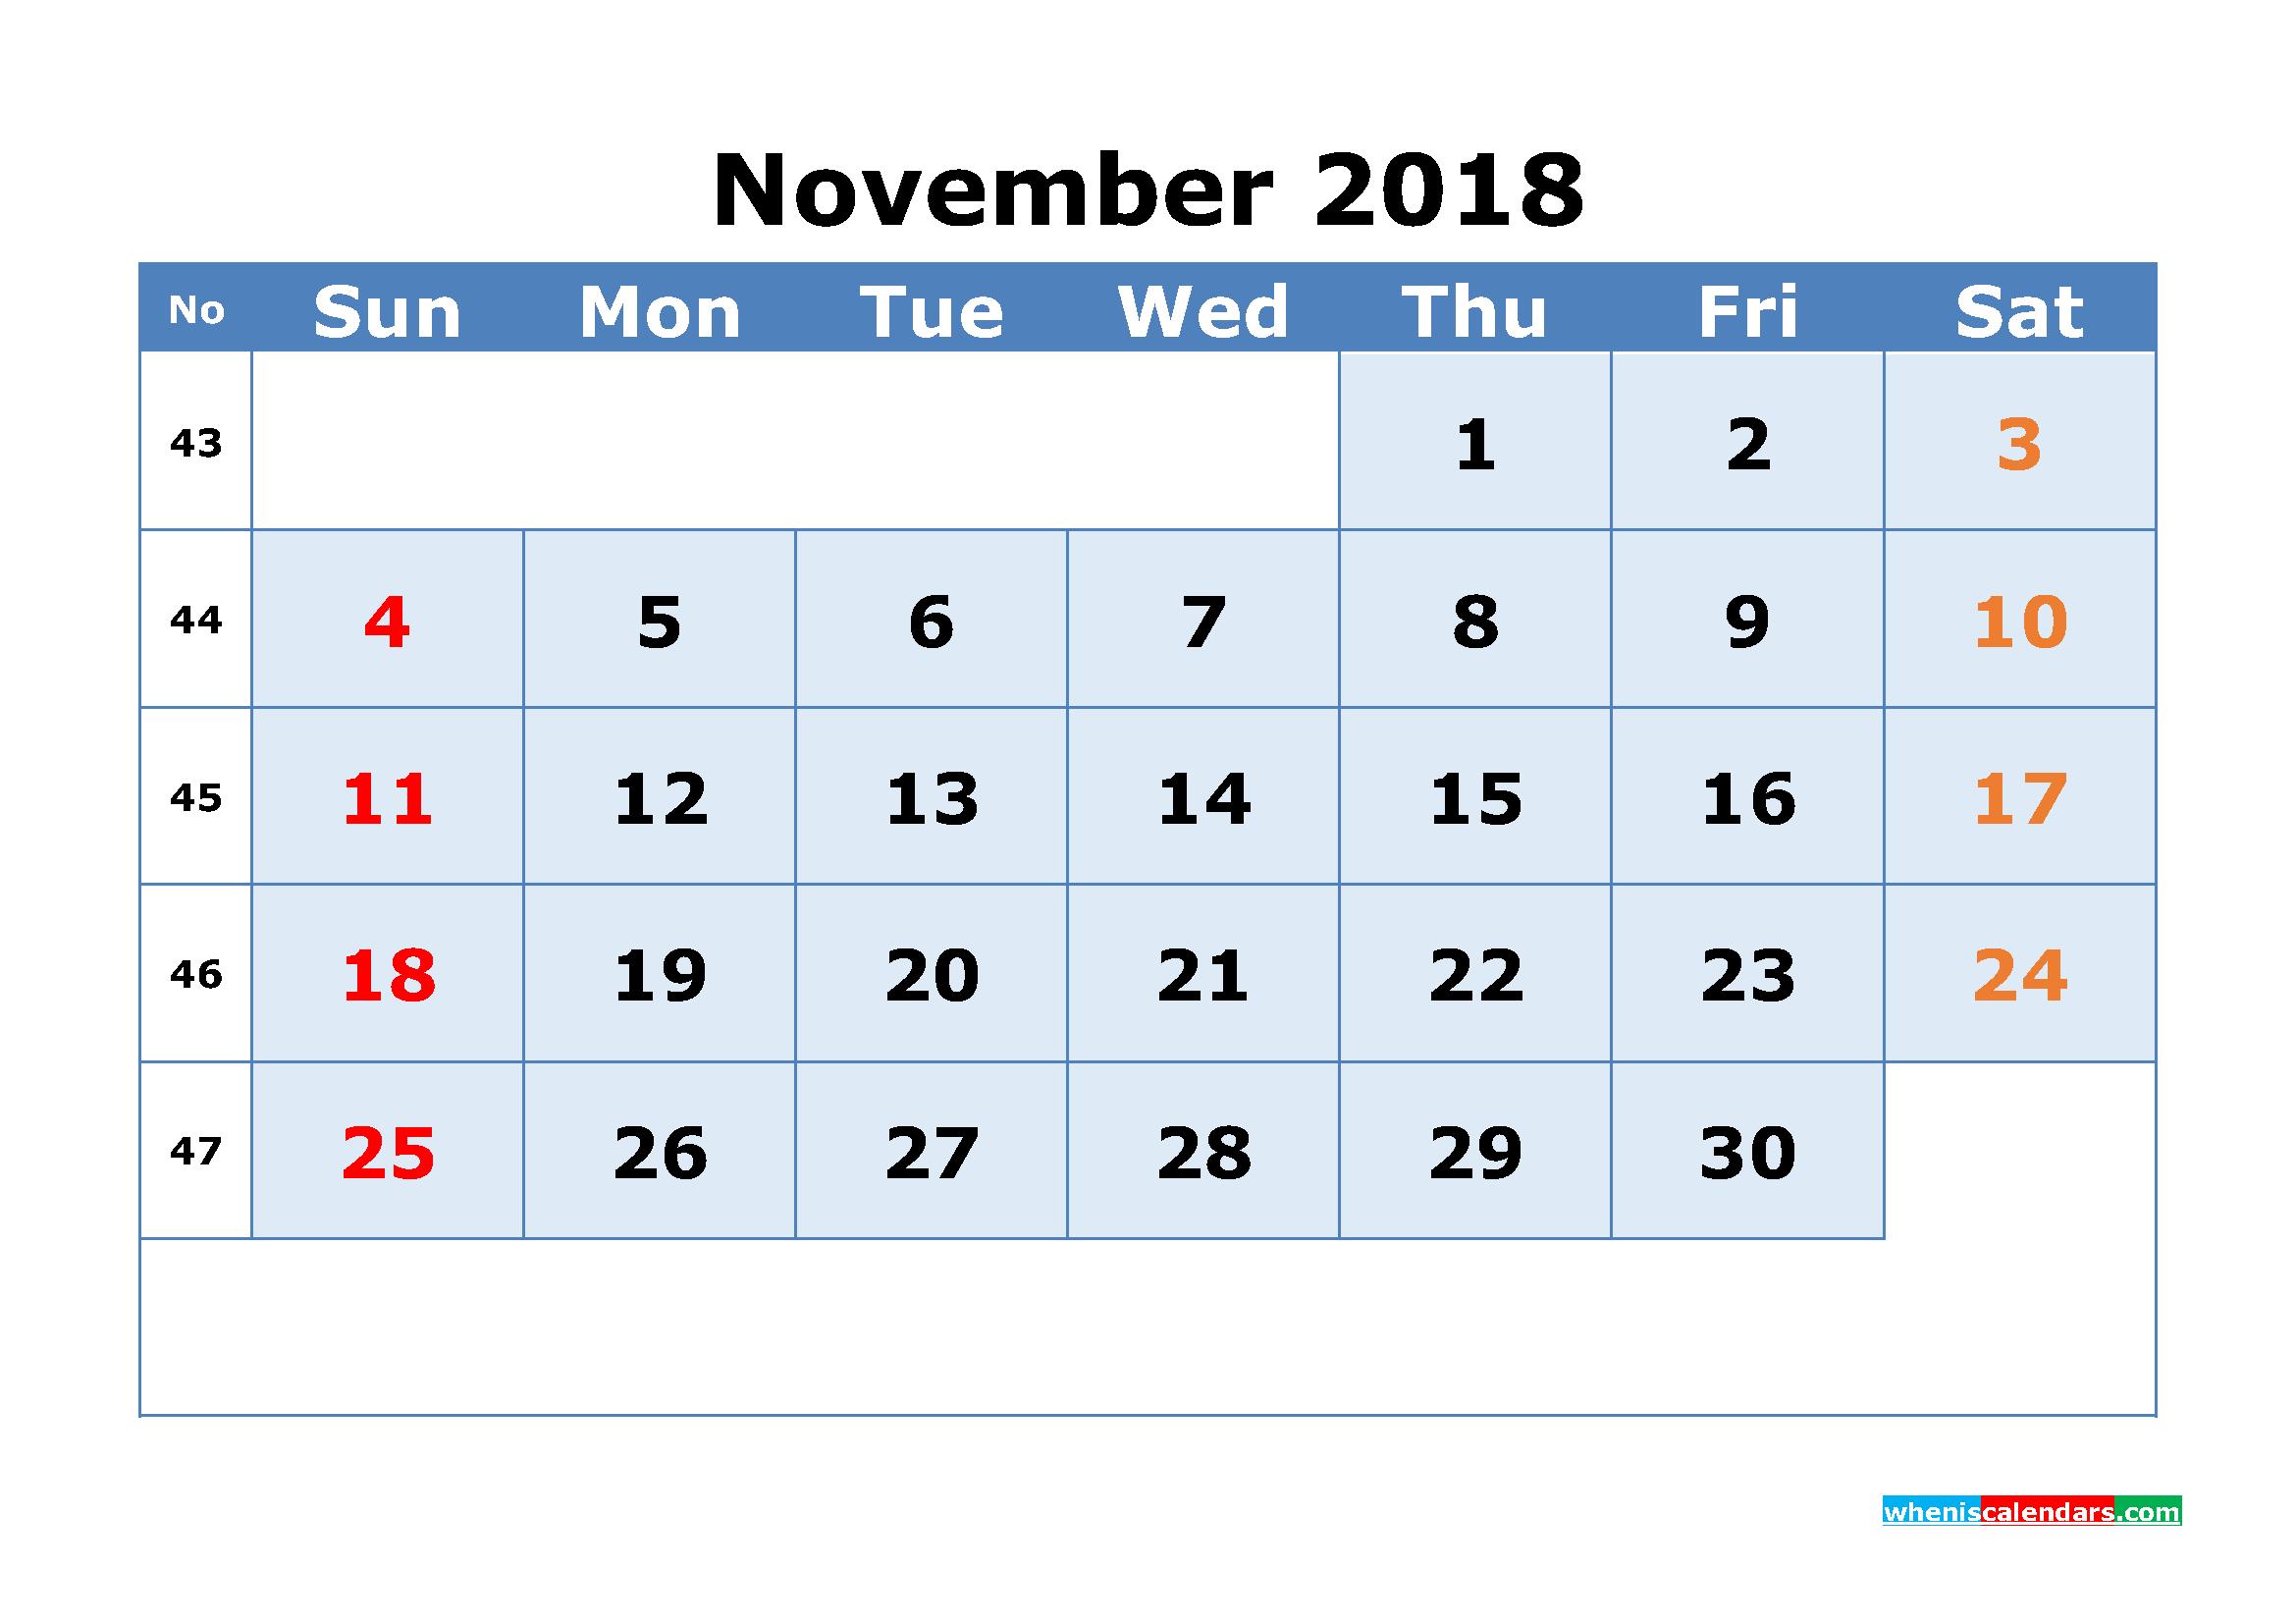 download november 2018 calendar